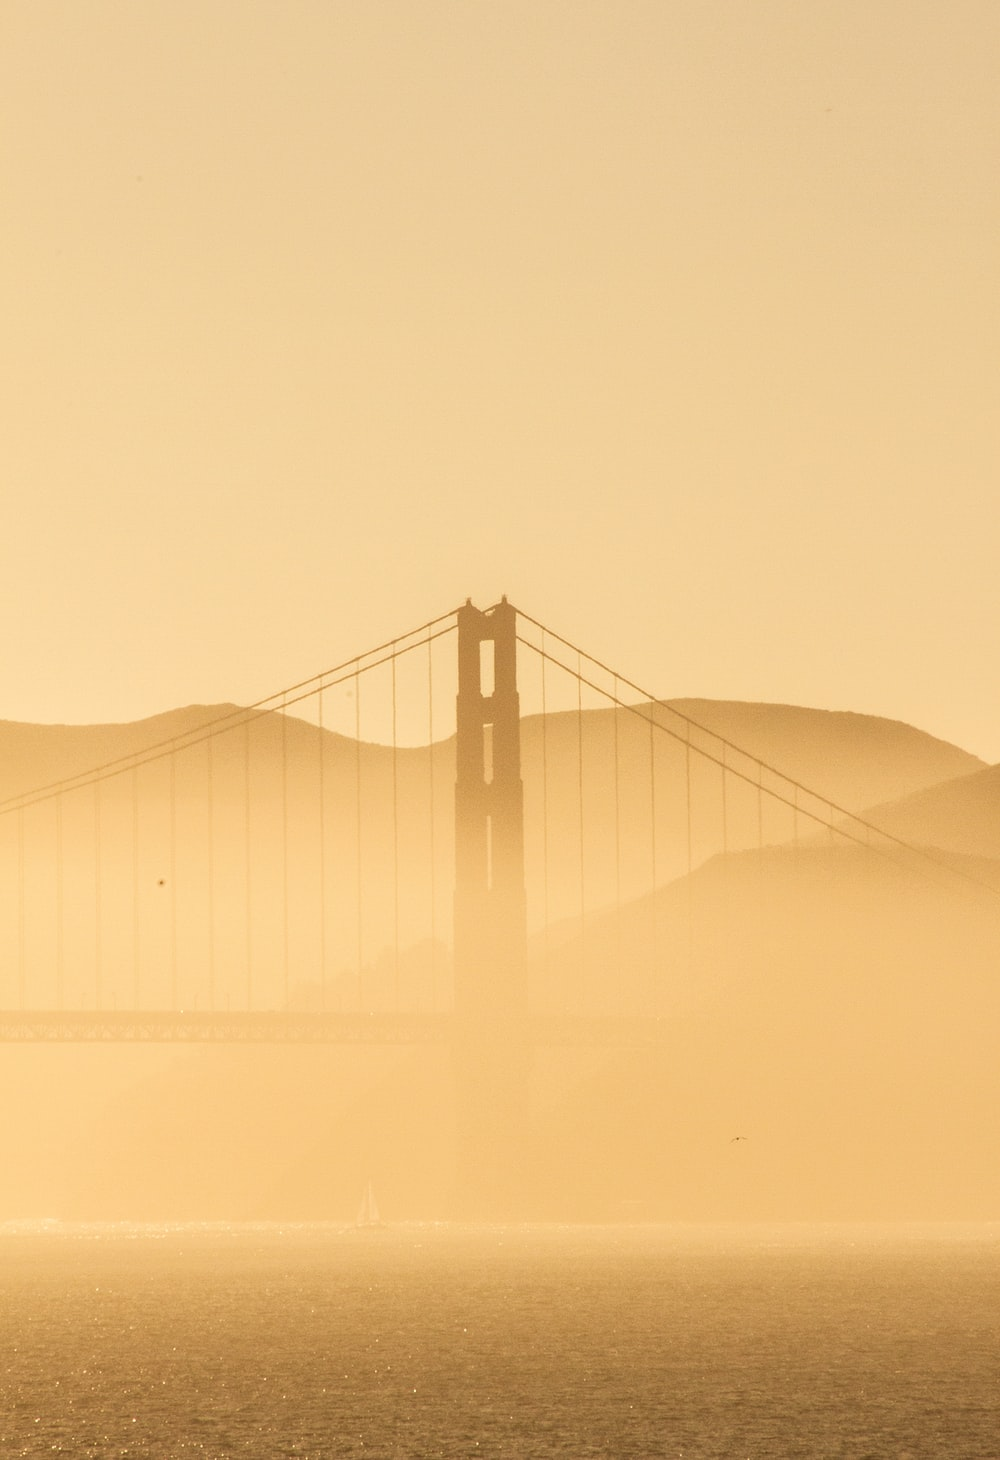 golden gate bridge covered with fog